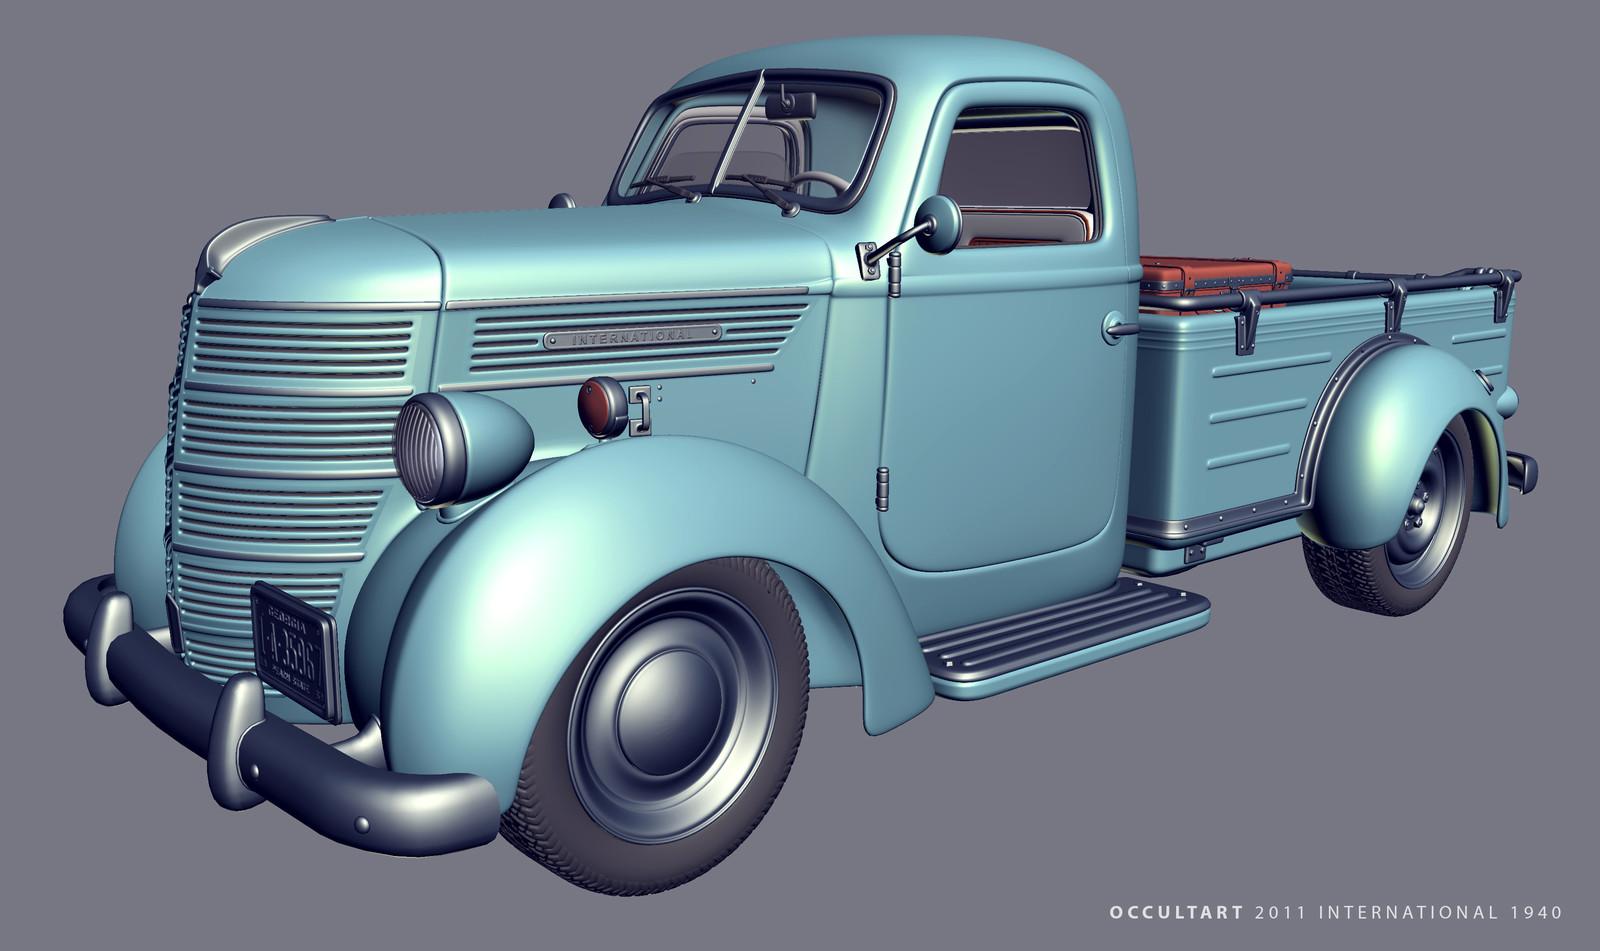 International 1940